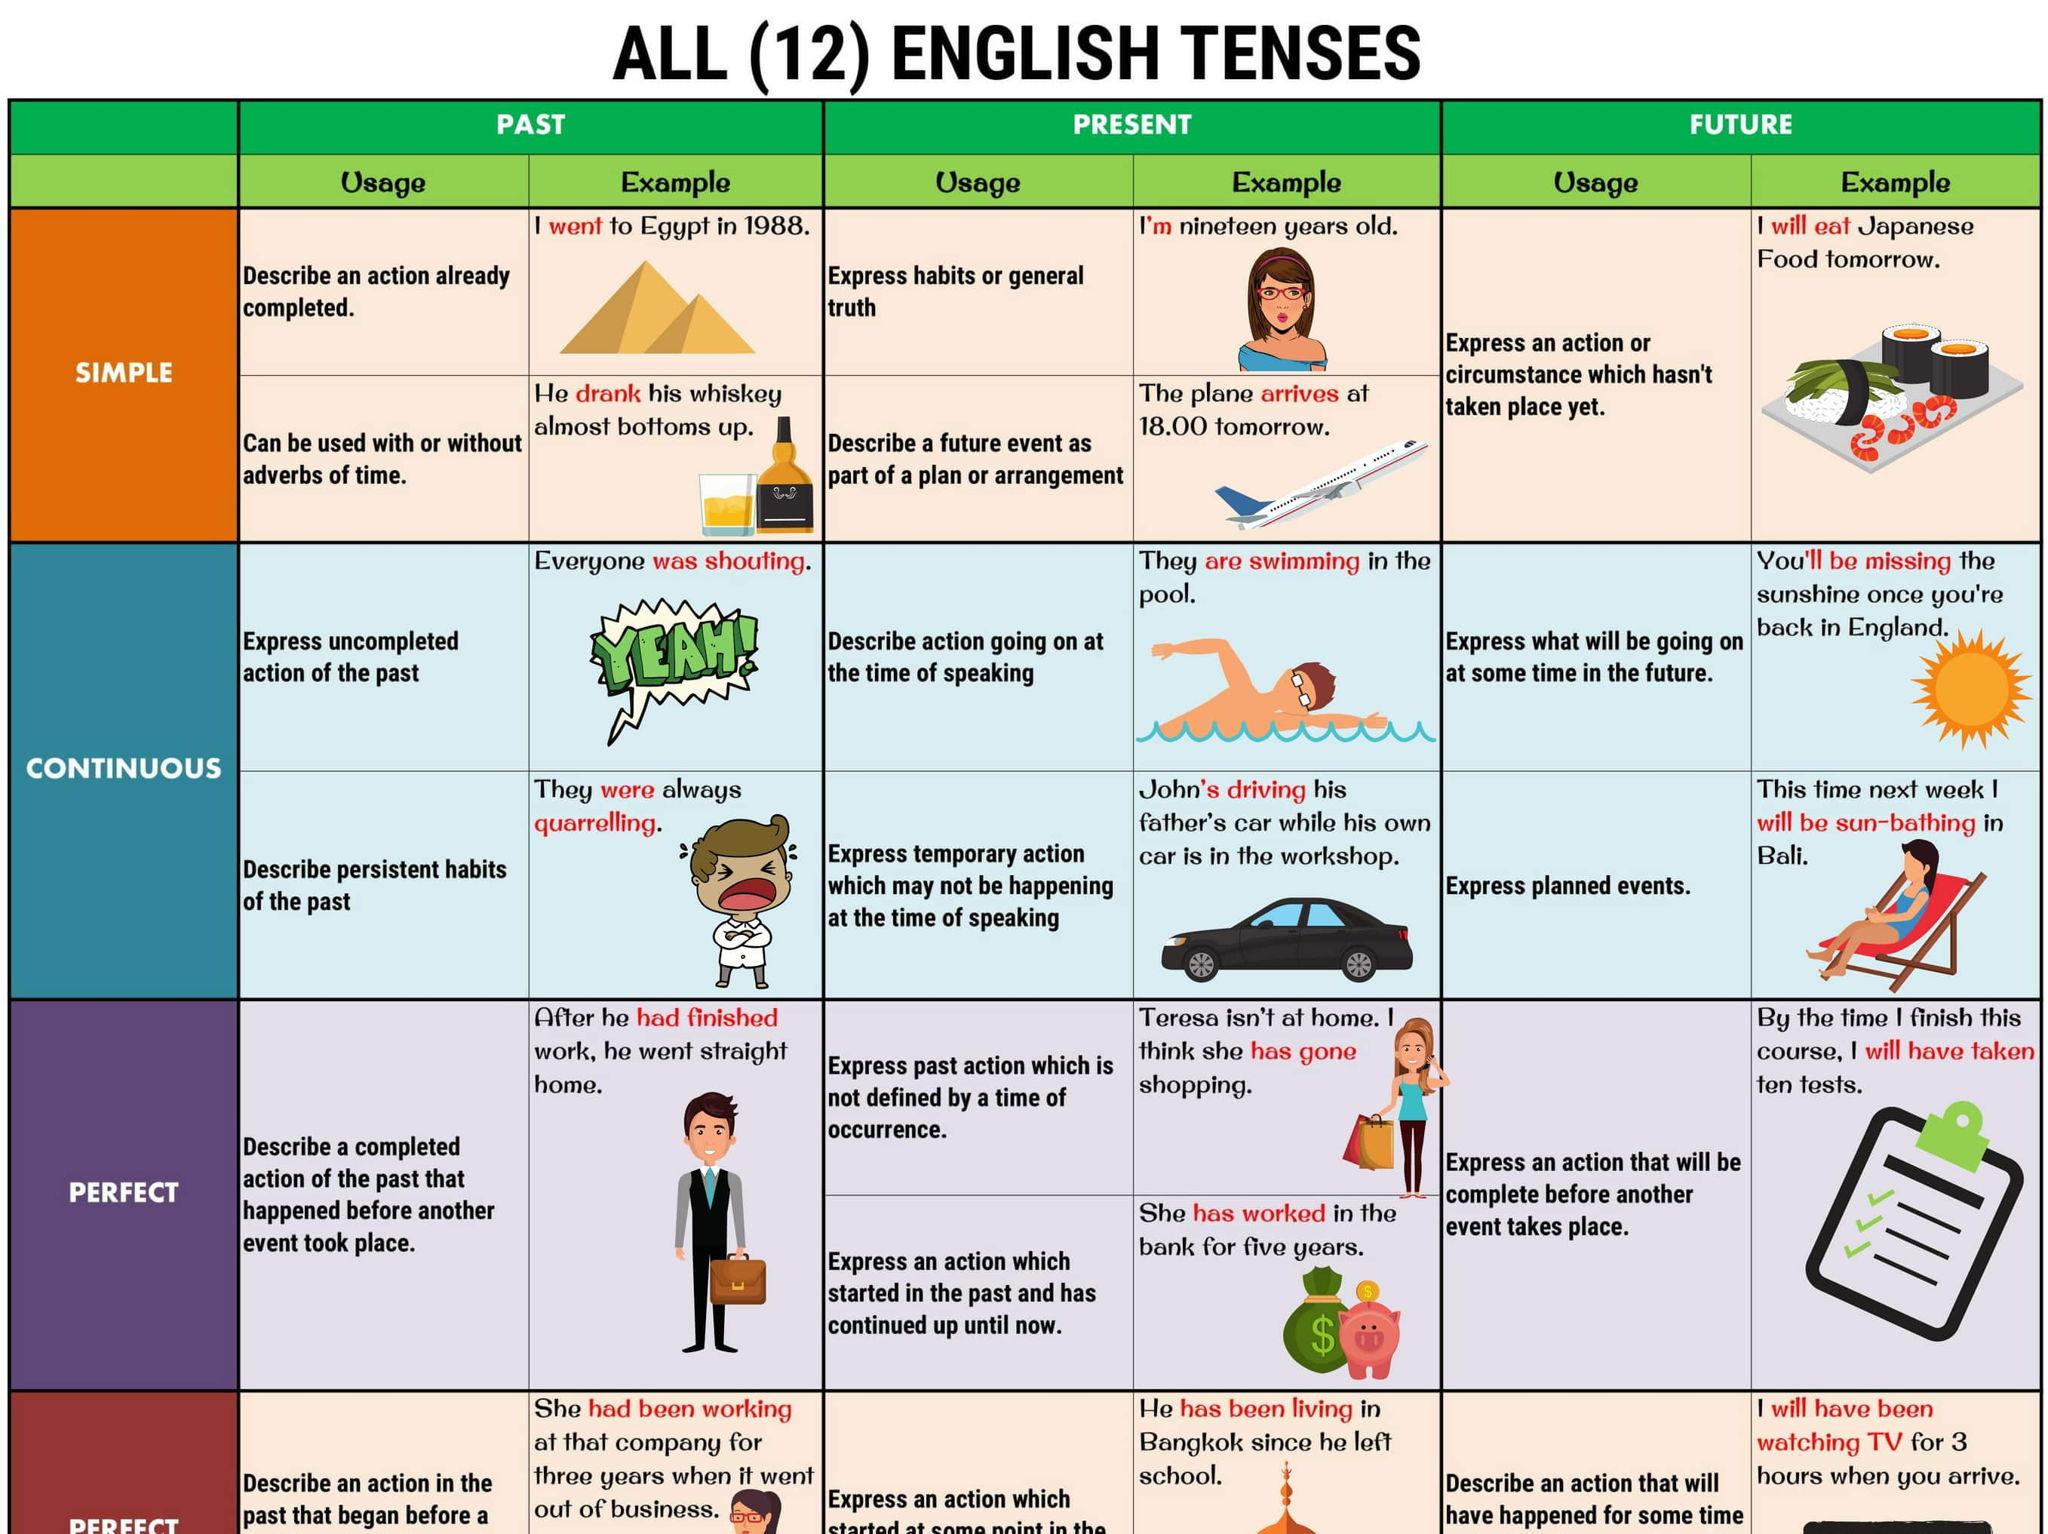 English Tenses handout